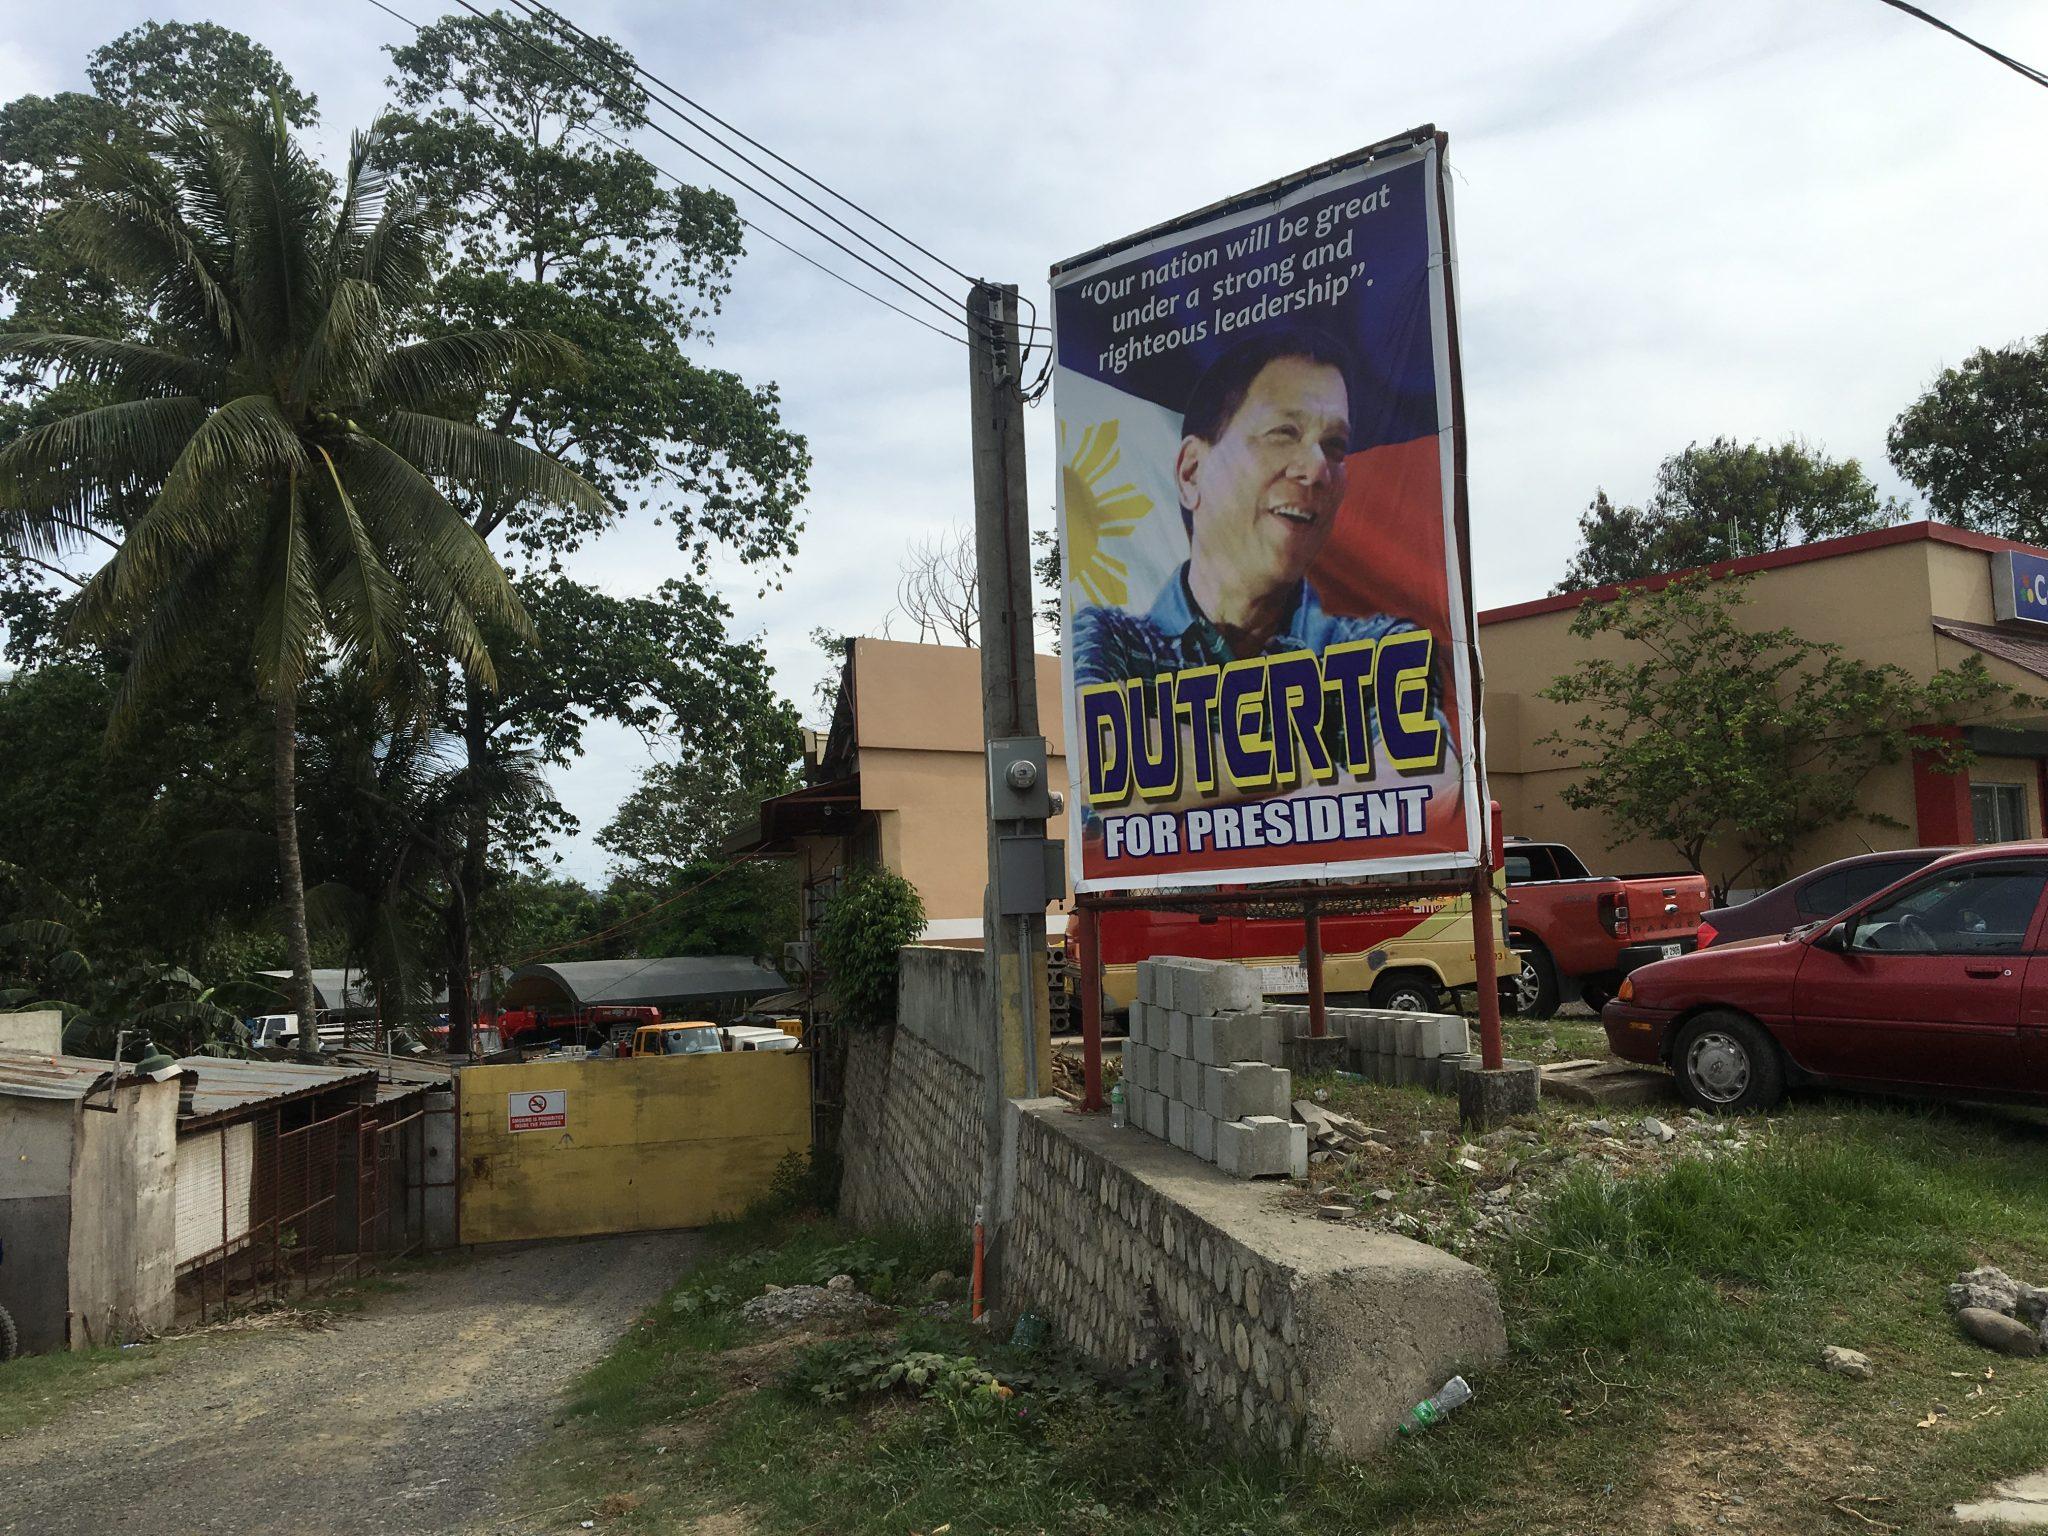 How to understand recent developments in Davao, Philippines